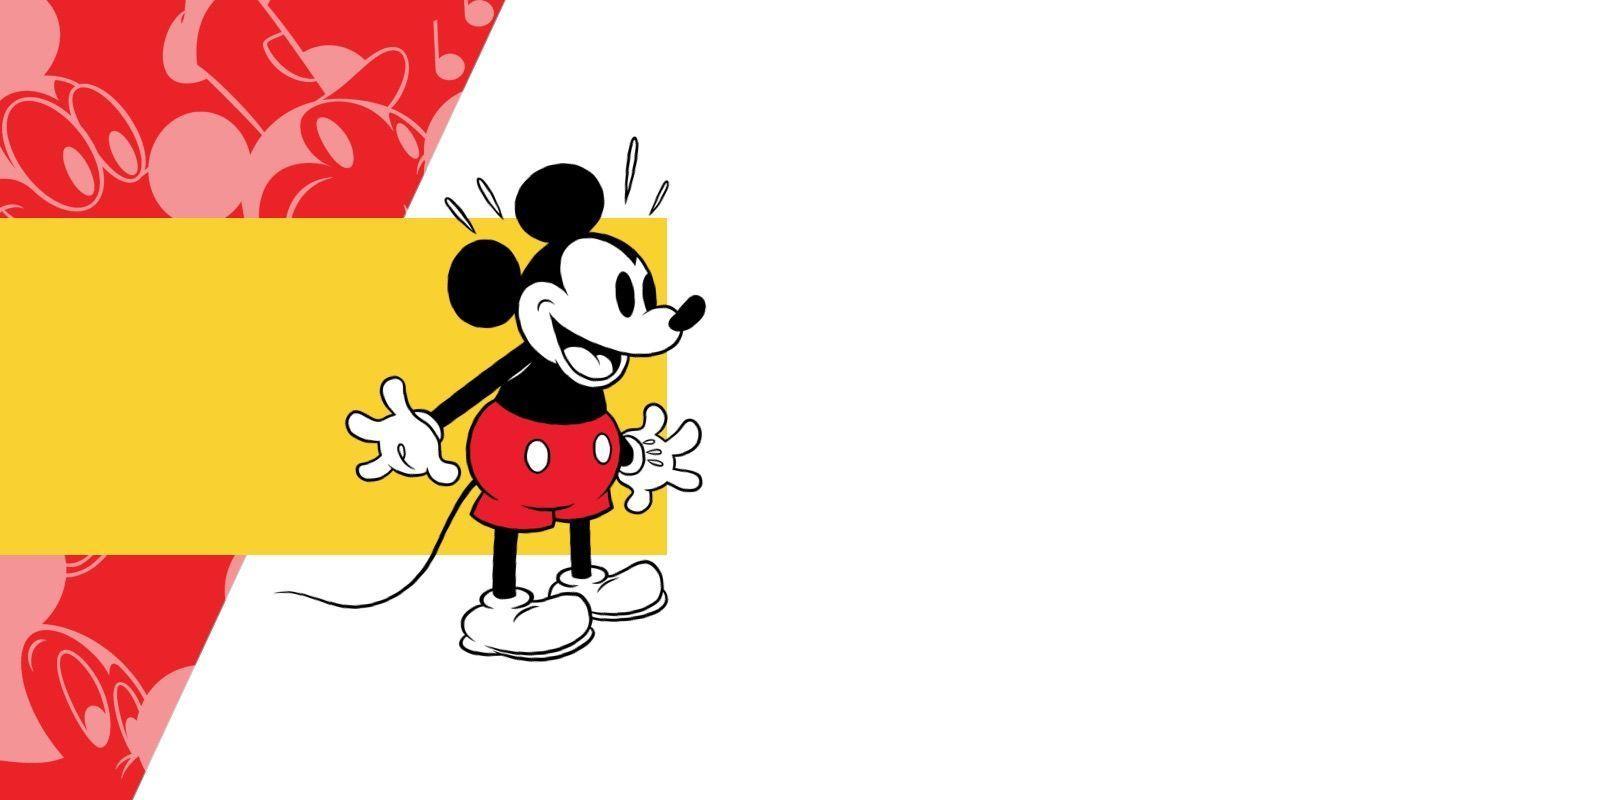 Mickey 90 | Celebrate 90 years of the 'True Original' Mickey